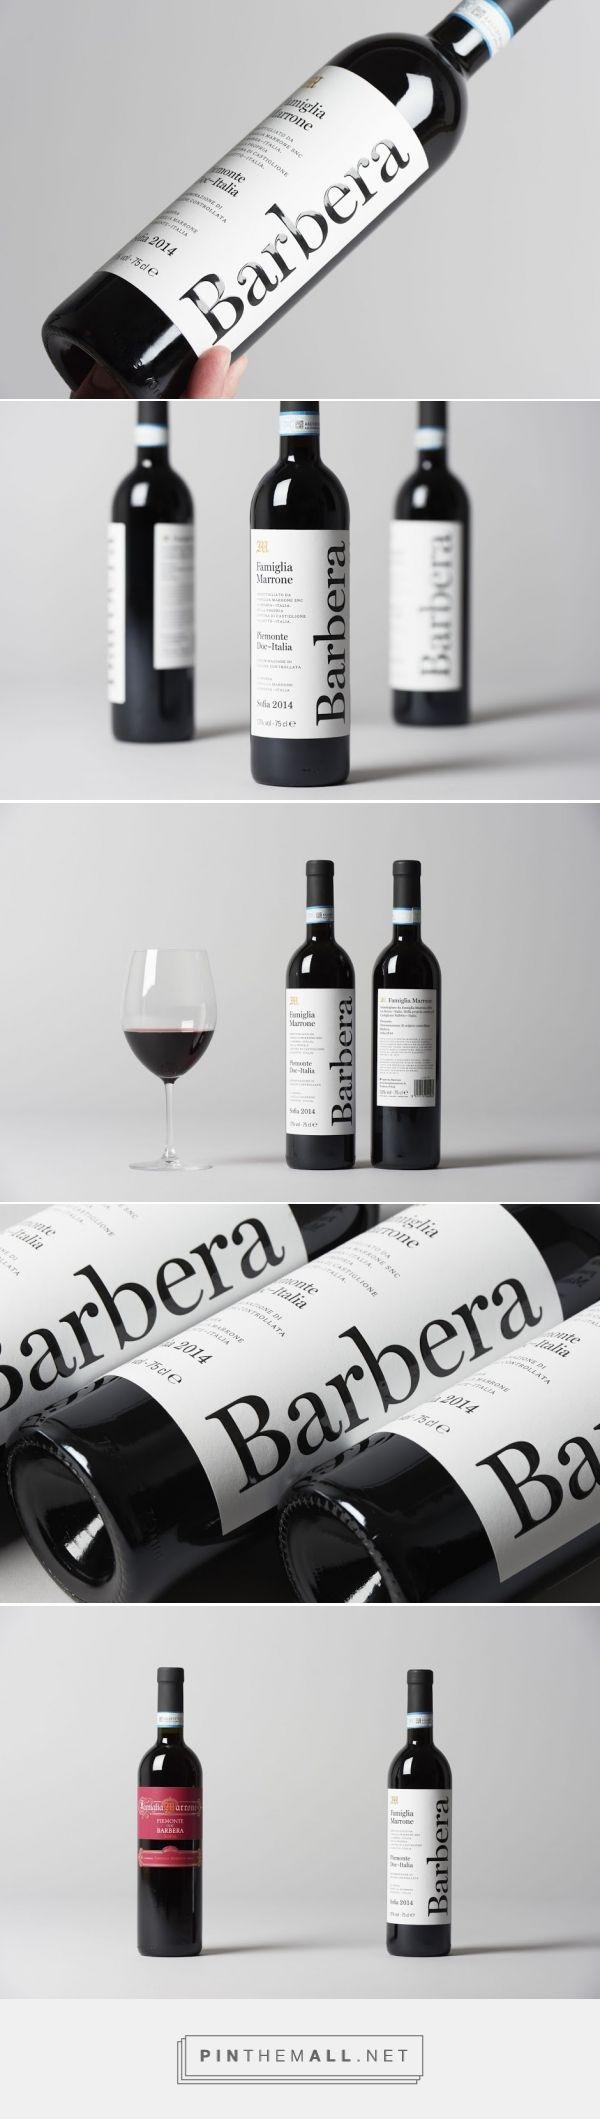 Barbera Marone Wine - Packaging of the World - Creative Package Design Gallery - http://www.packagingoftheworld.com/2016/05/barbera-marone.html